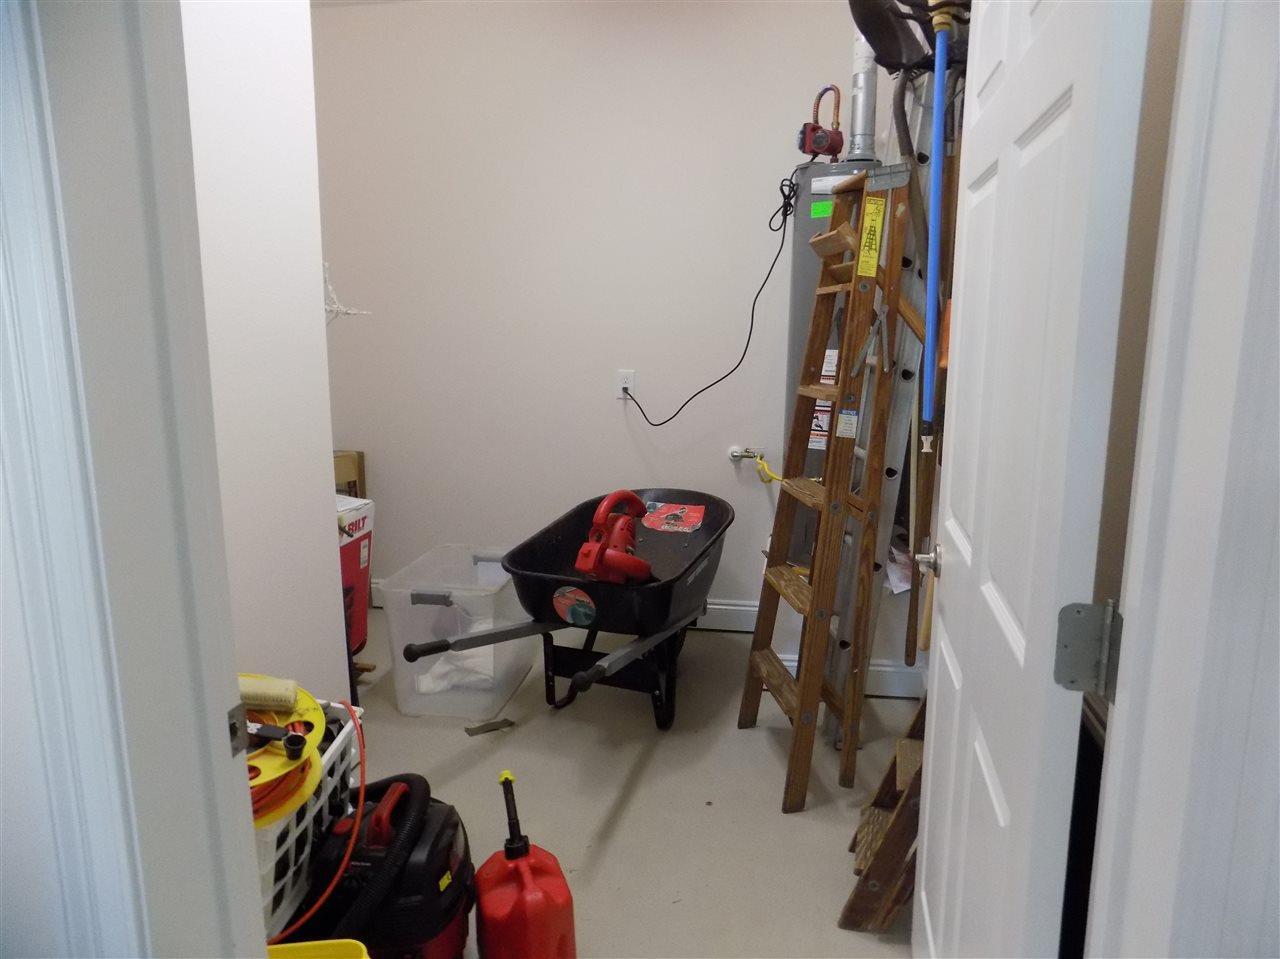 2177 Staff Dr, Cantonment, FL 32533